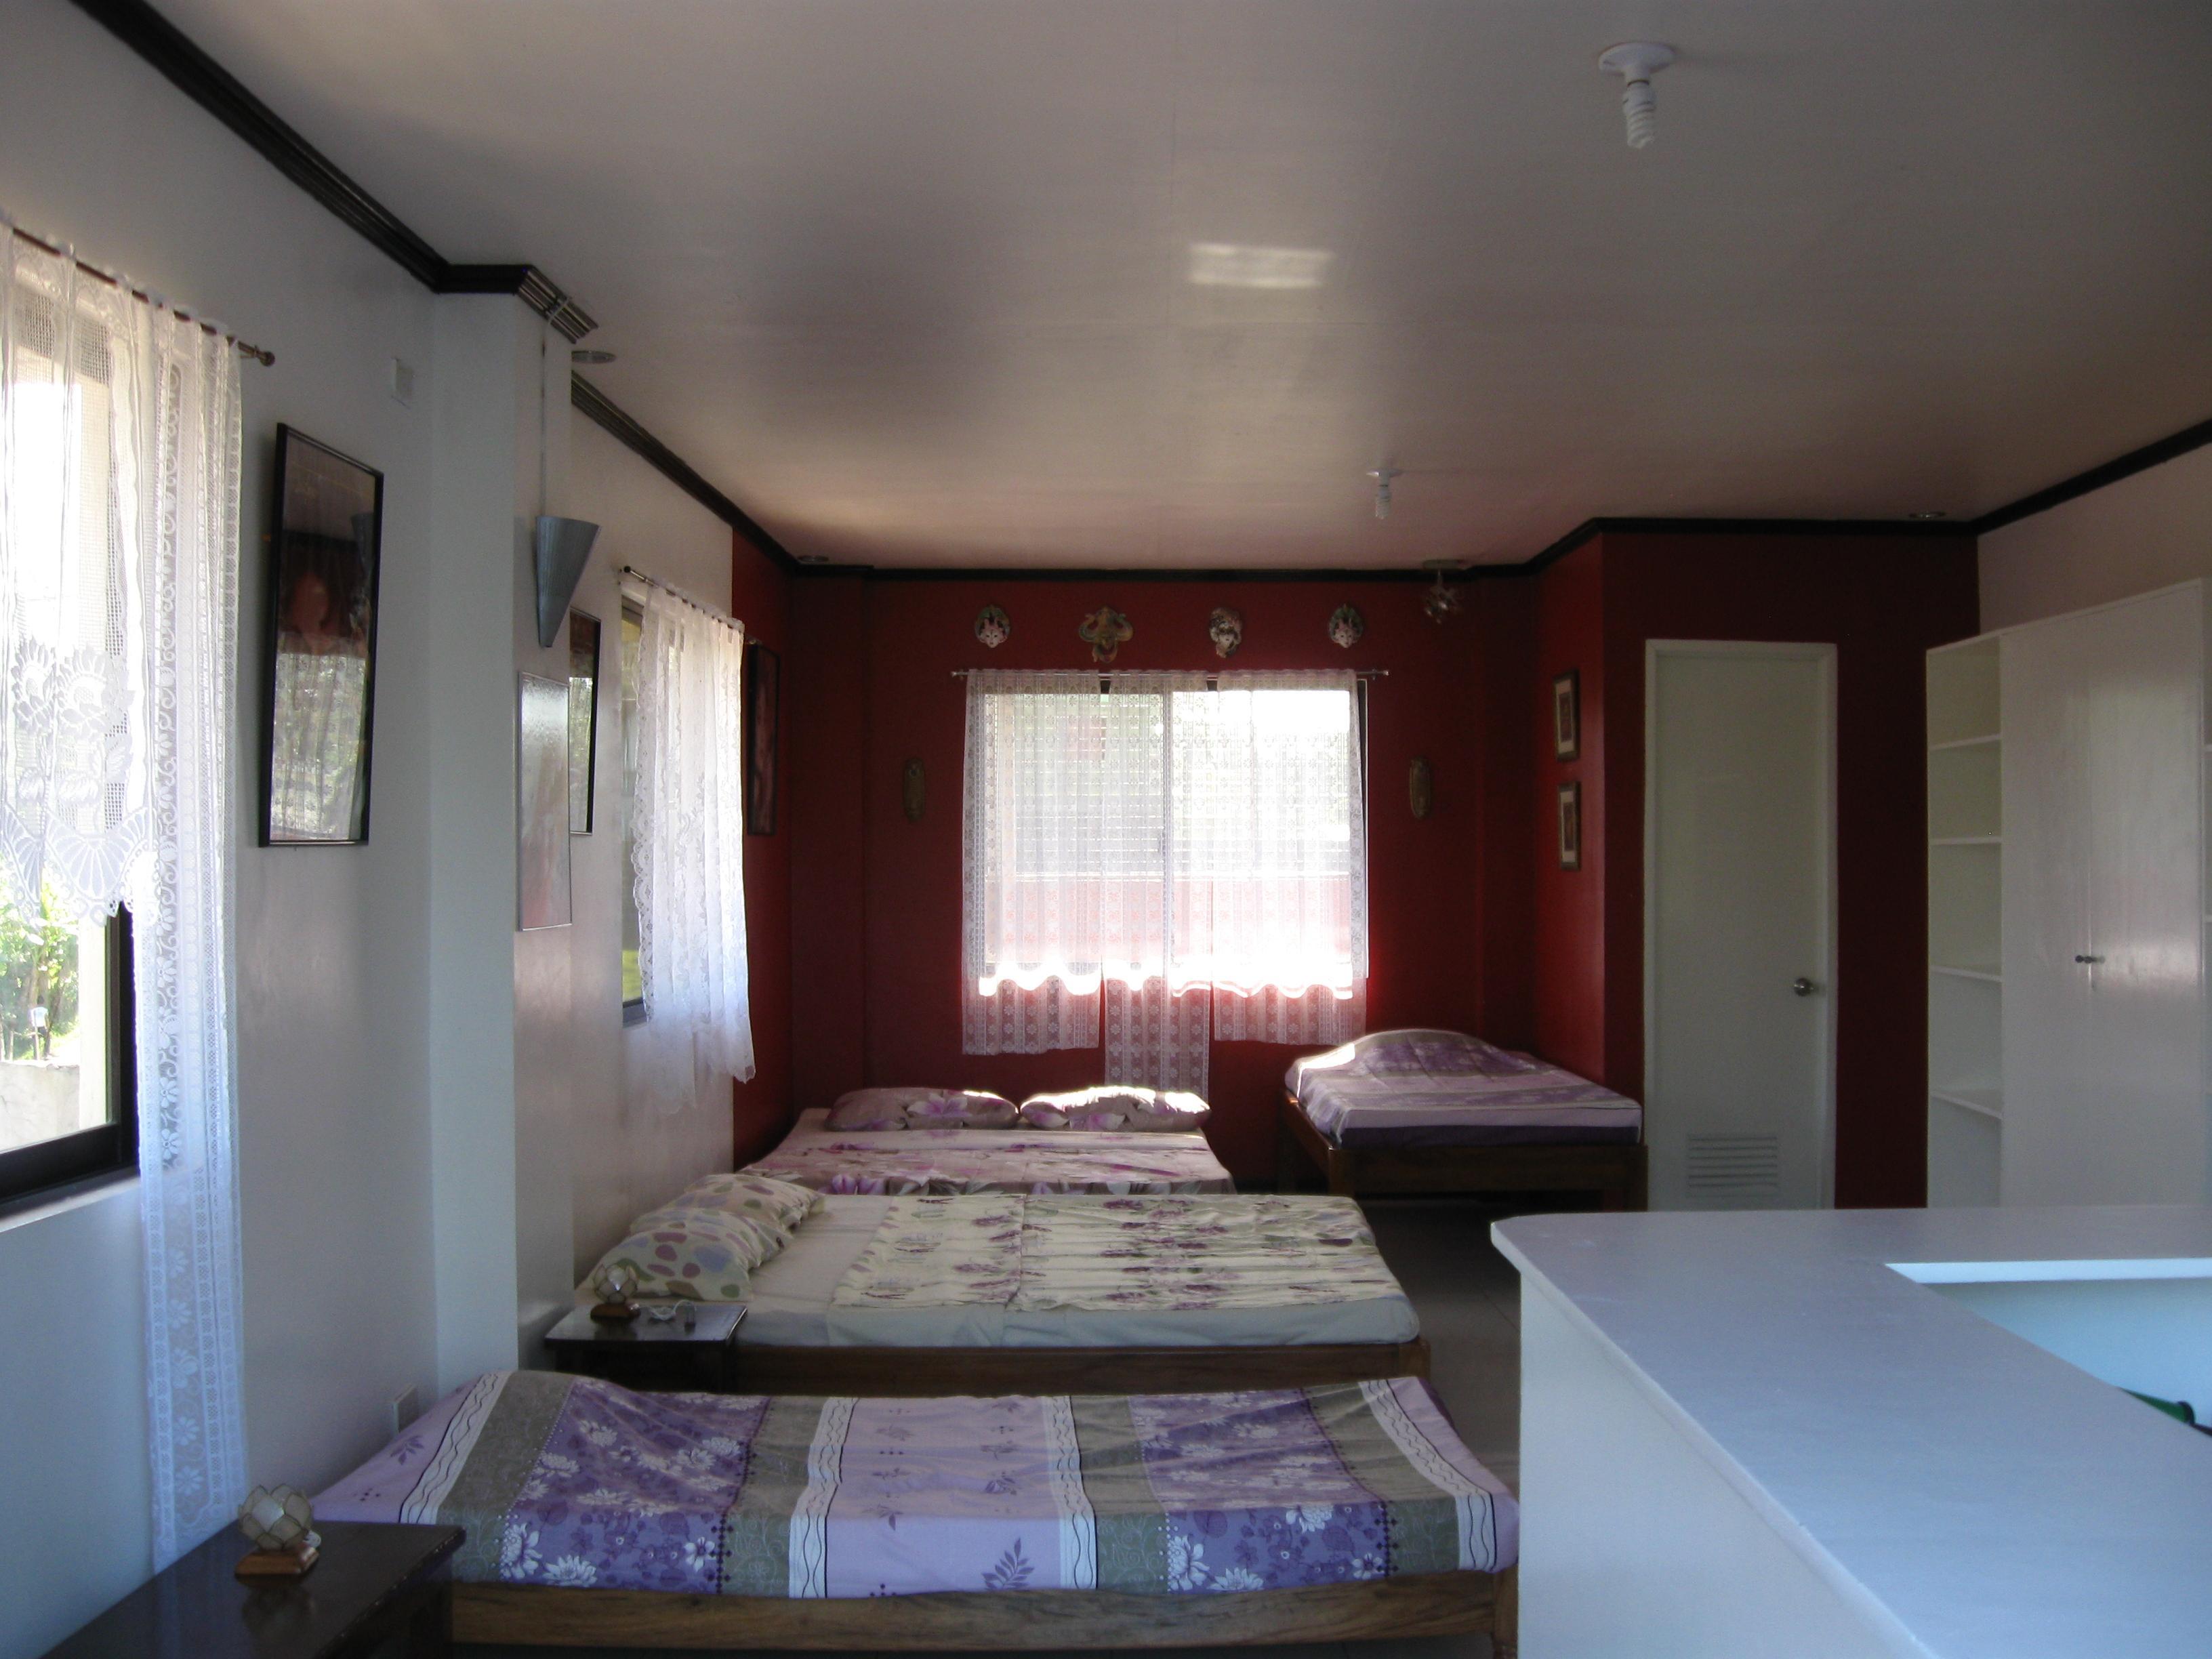 La Tierrez Bed and Breakfast